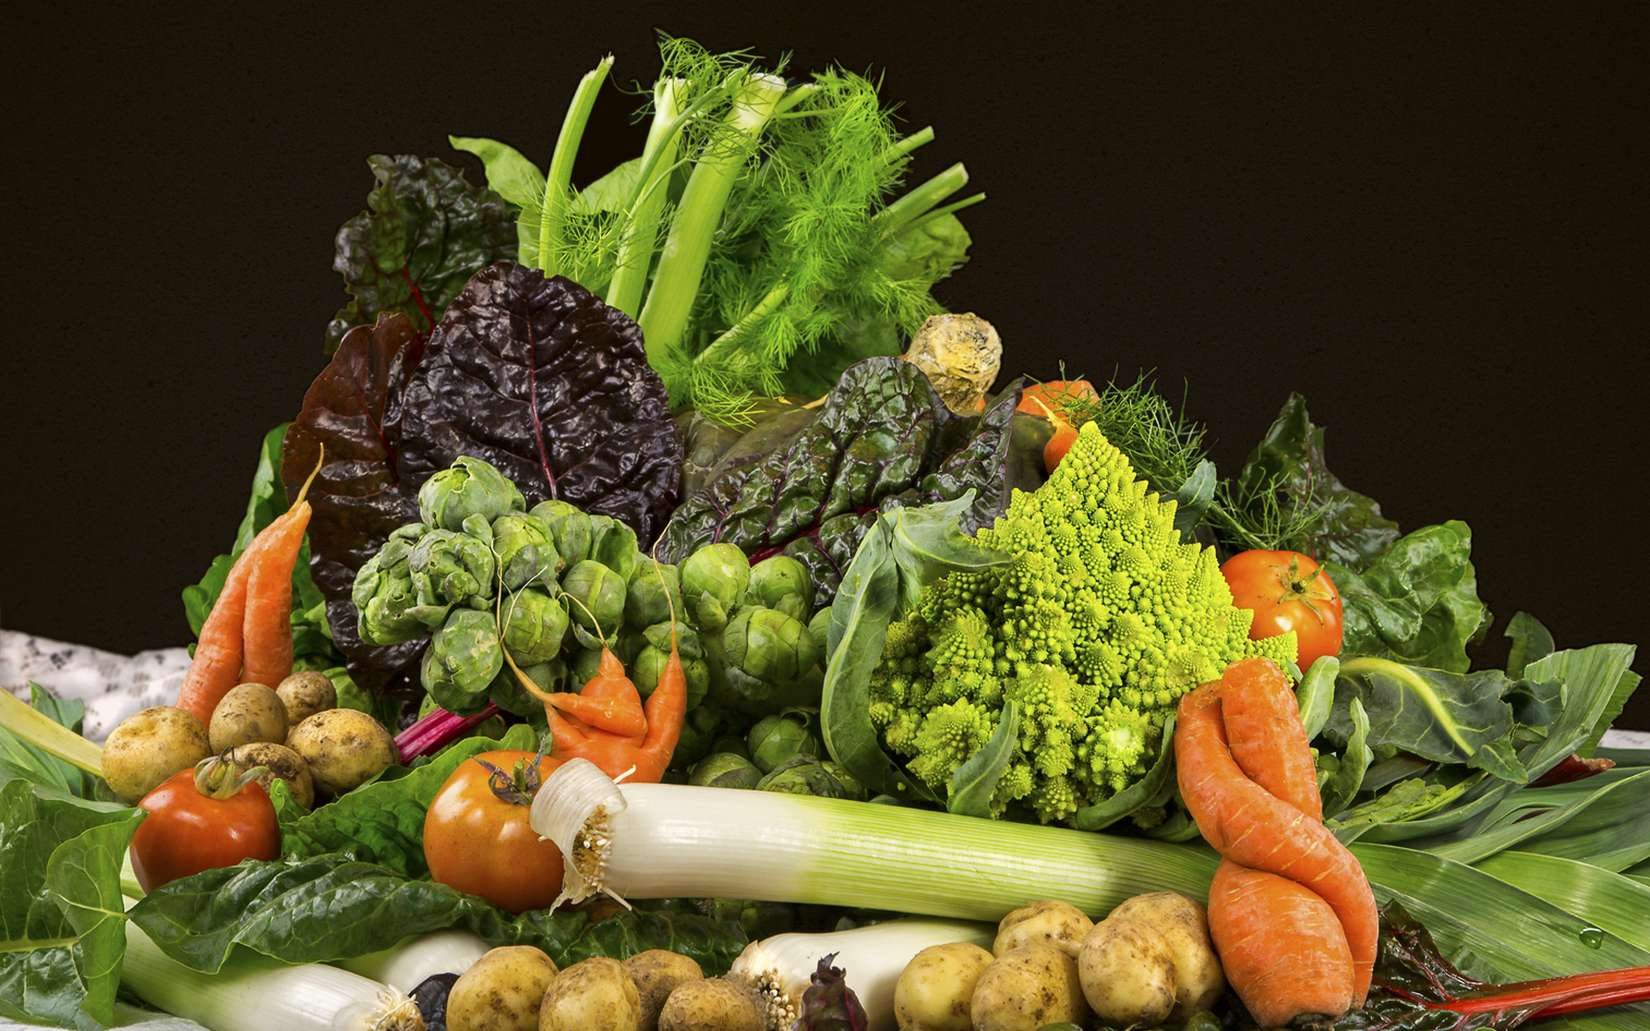 Légumes d'hiver. © Pxhere.com